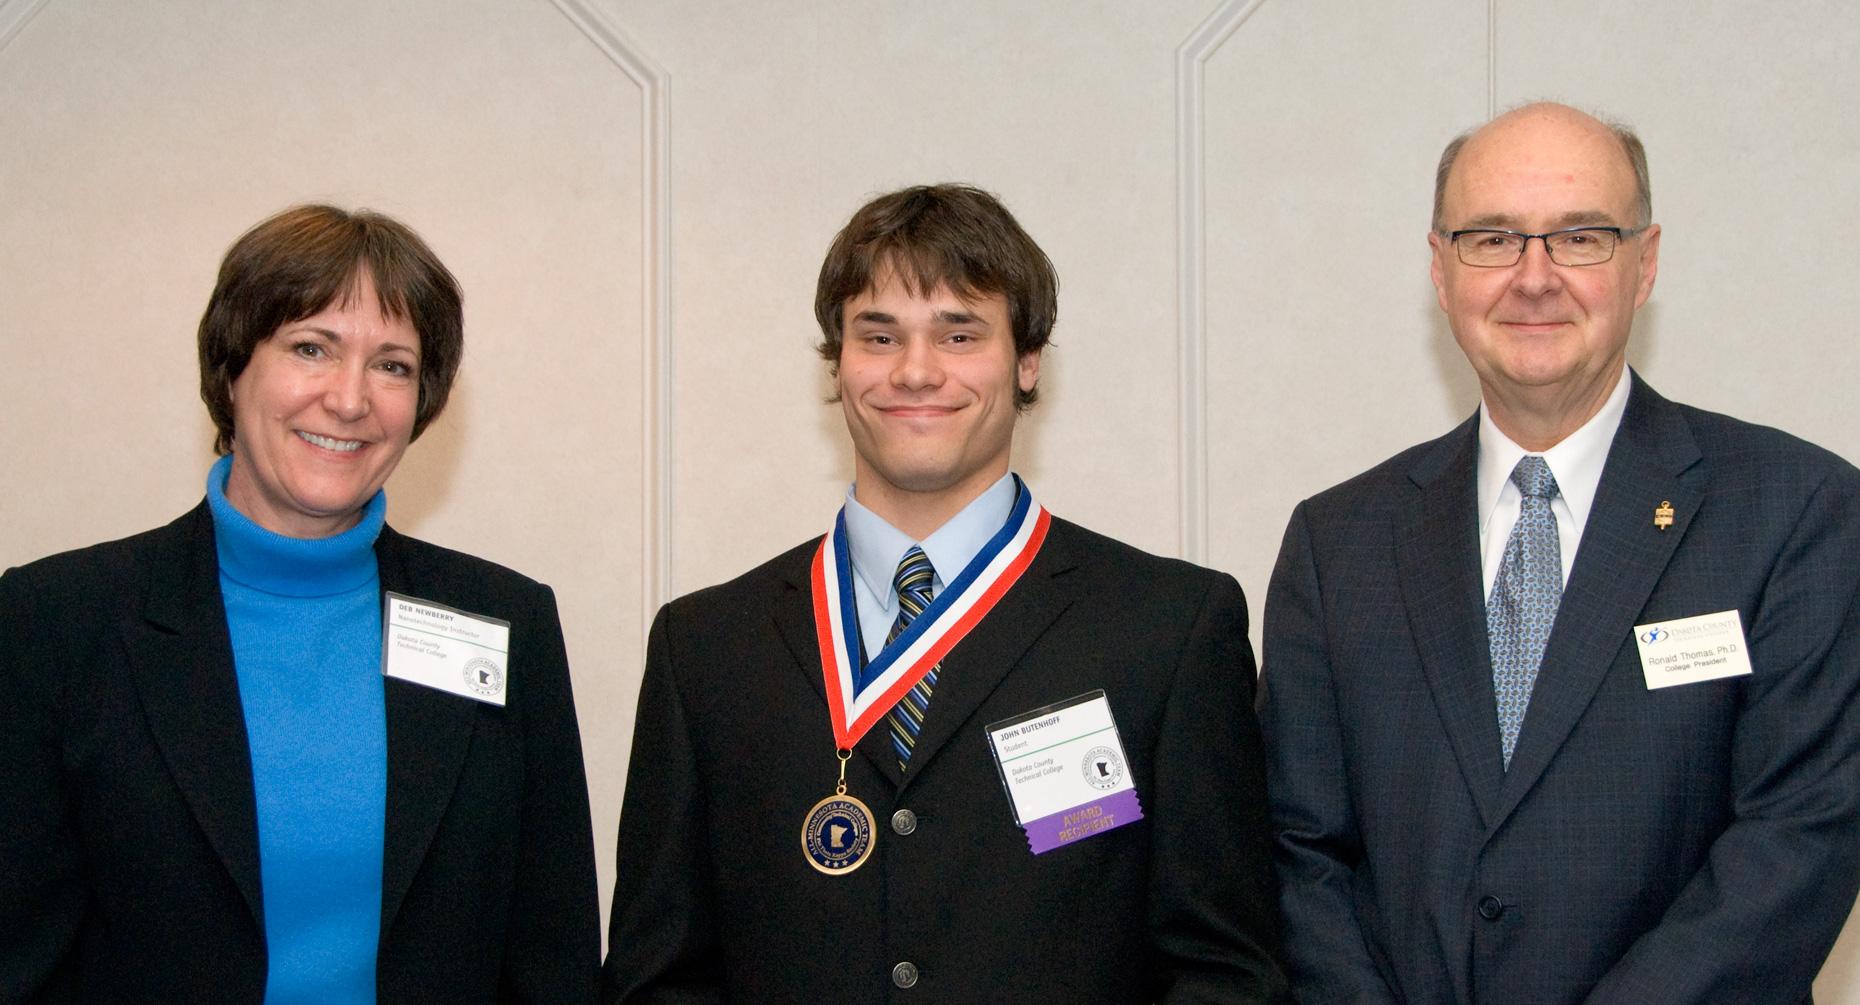 Nanoscience Tech Director Deb Newberry, John Butenhoff, DCTC President Ron Thomas